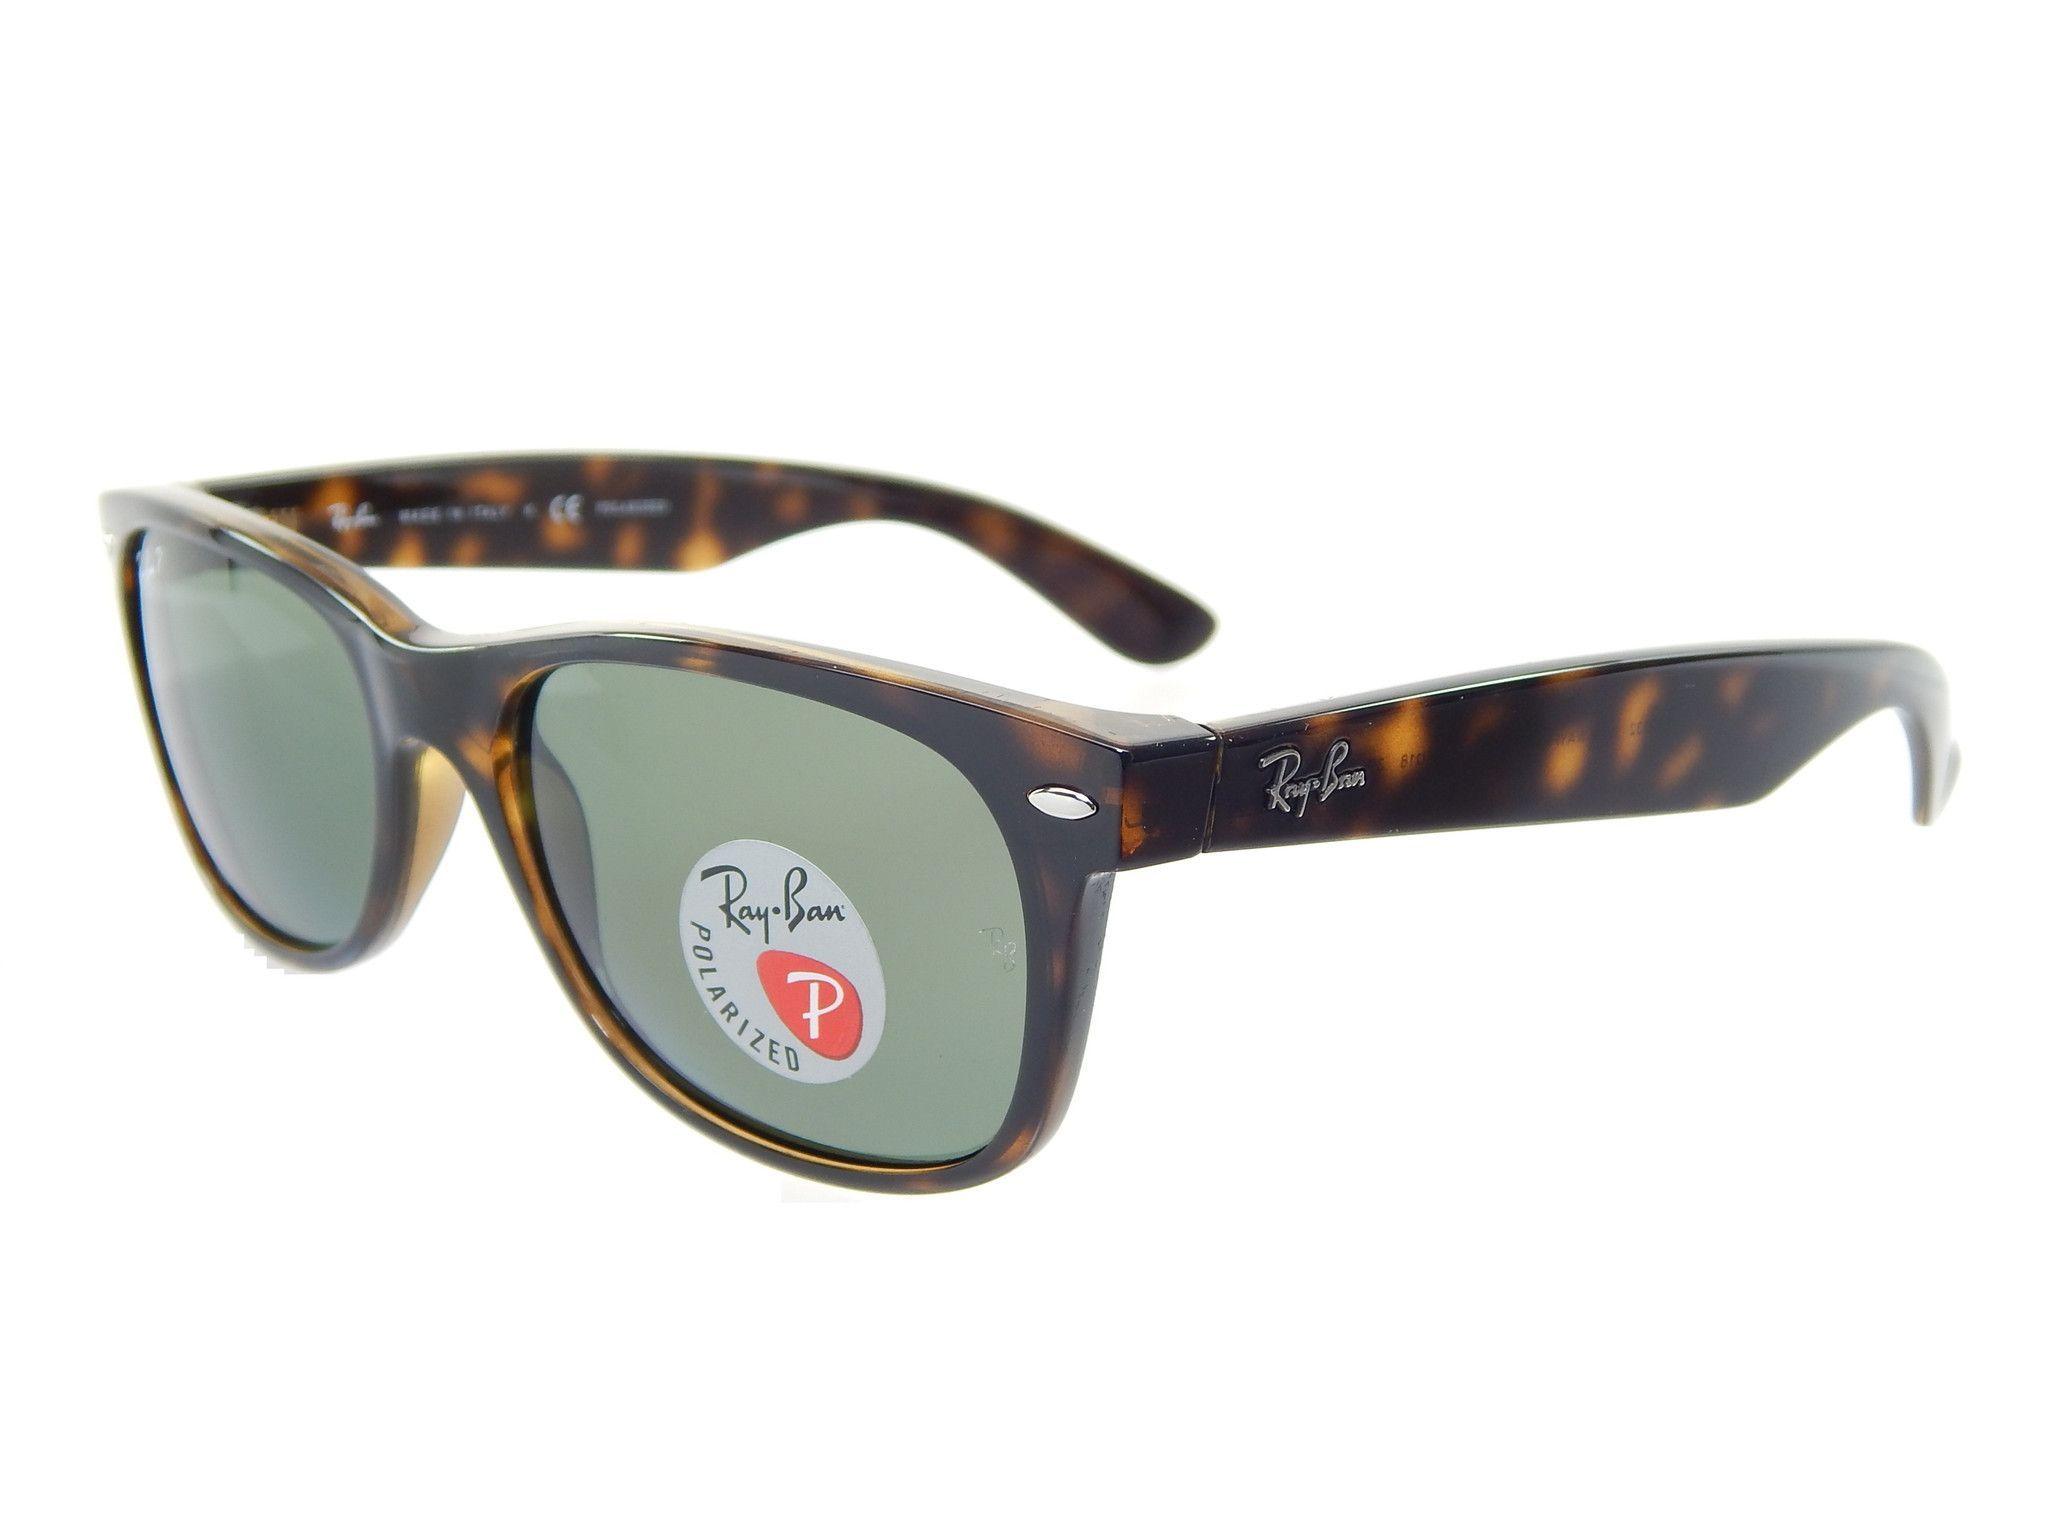 72e2f43846 ... sale ray ban wayfarer rb2132 902 58 tortoise green classic g 15 55mm  polarized 50721 d83d5